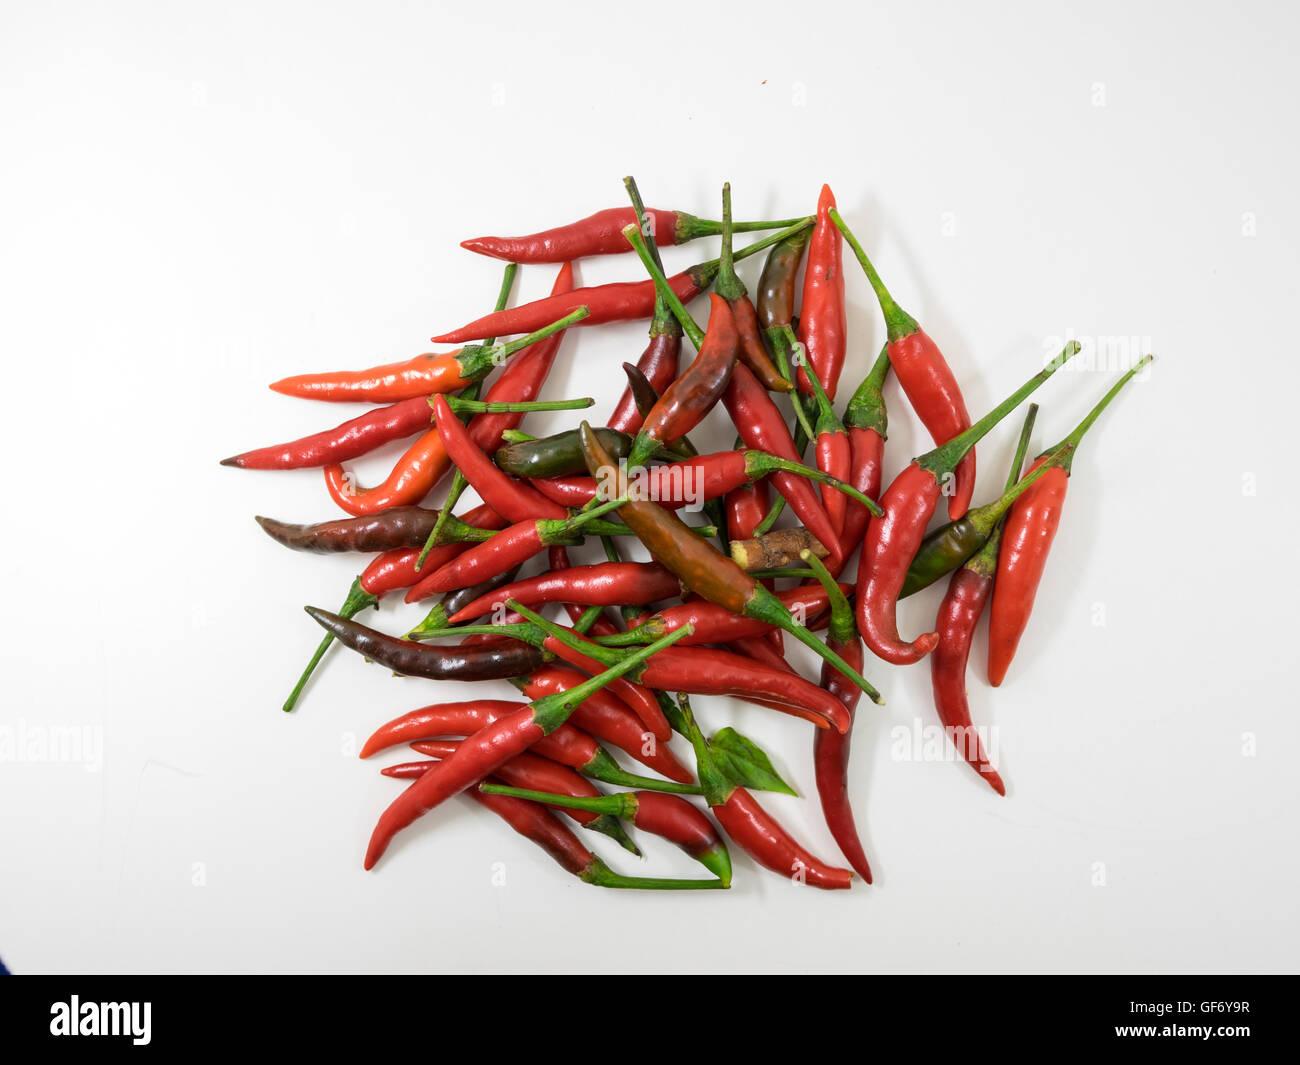 Chili essen Kraut Heilpflanzen würzen Zutat Aroma würzen Guinea-Pfeffer Stockbild